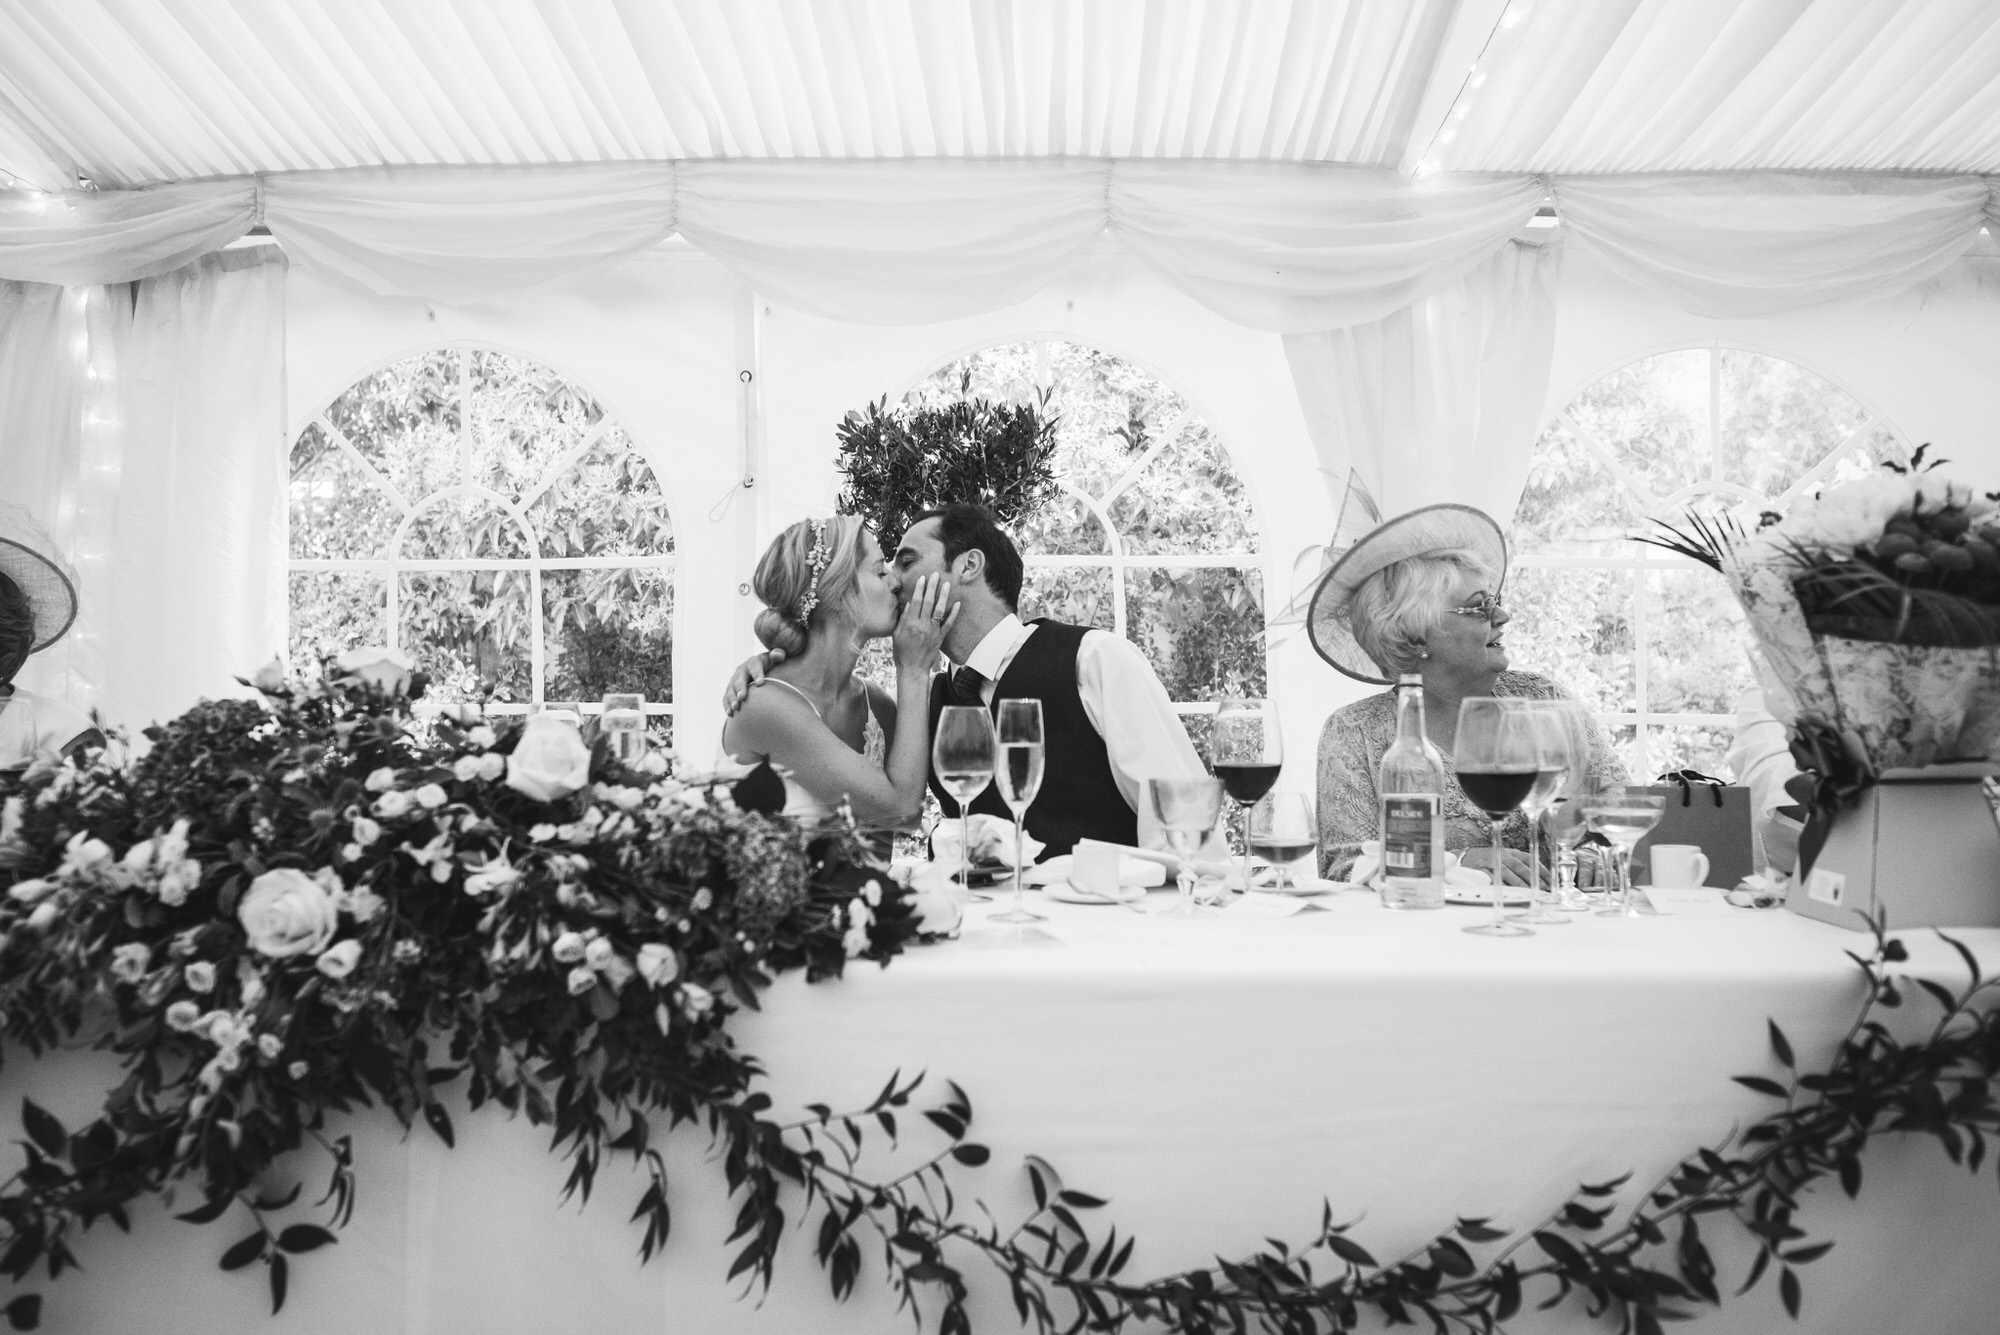 Dorset marquee wedding by the sea simon biffen photography 46